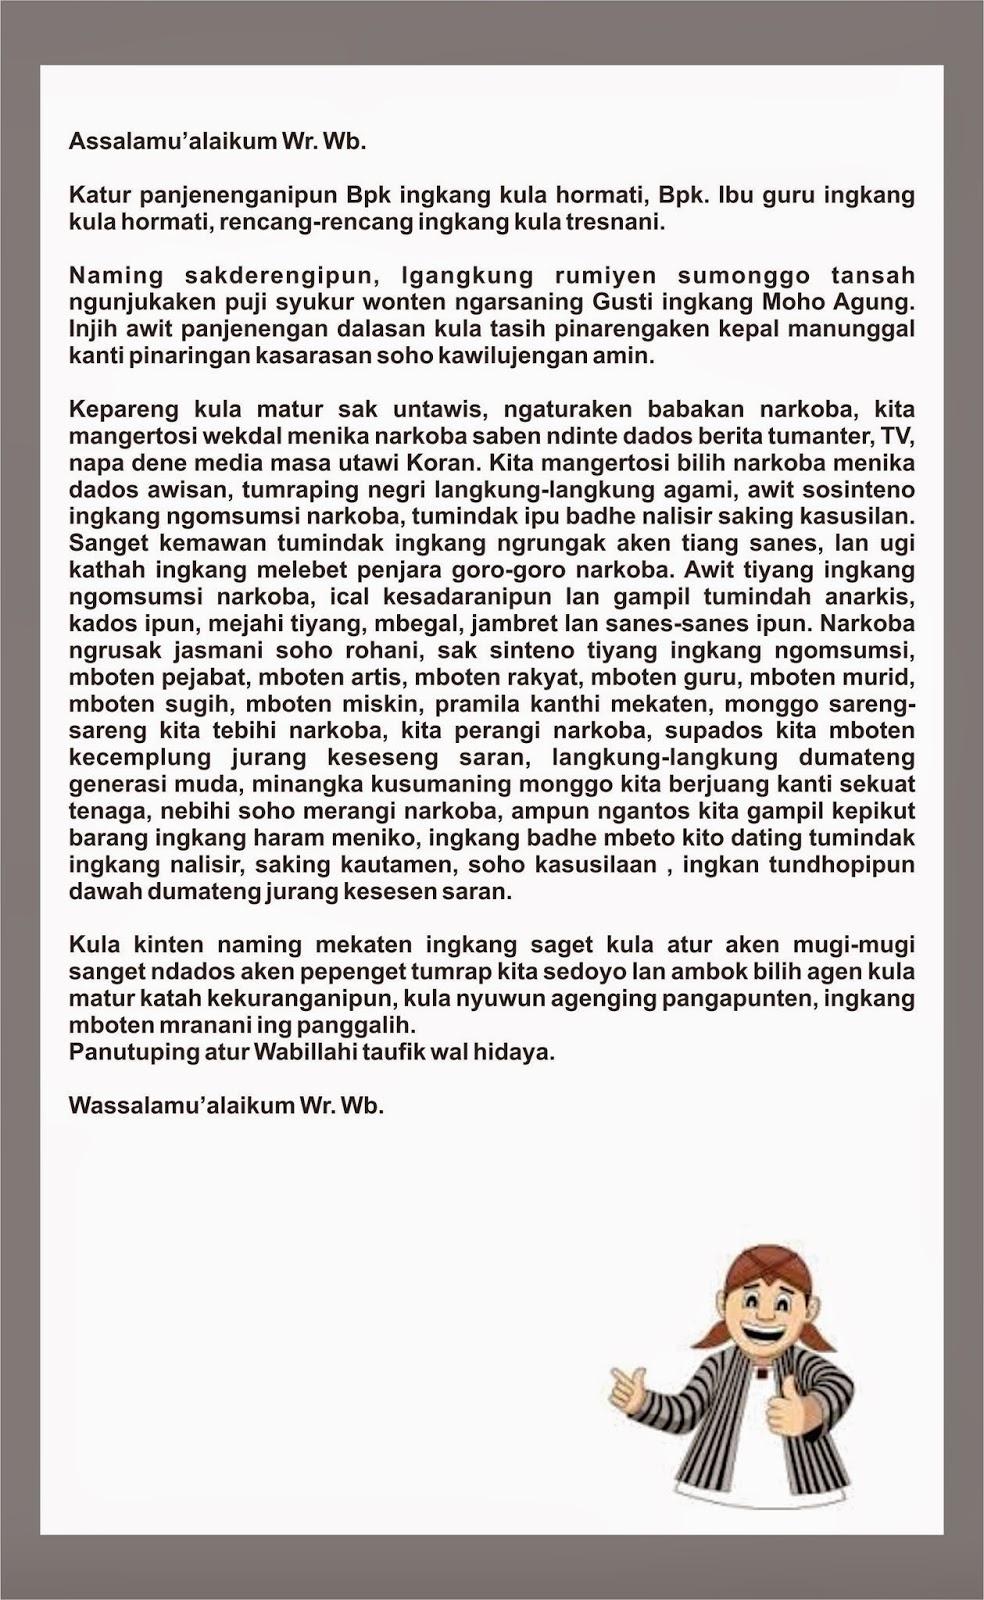 Contoh Geguritan Tema Pendidikan Feed News Indonesia